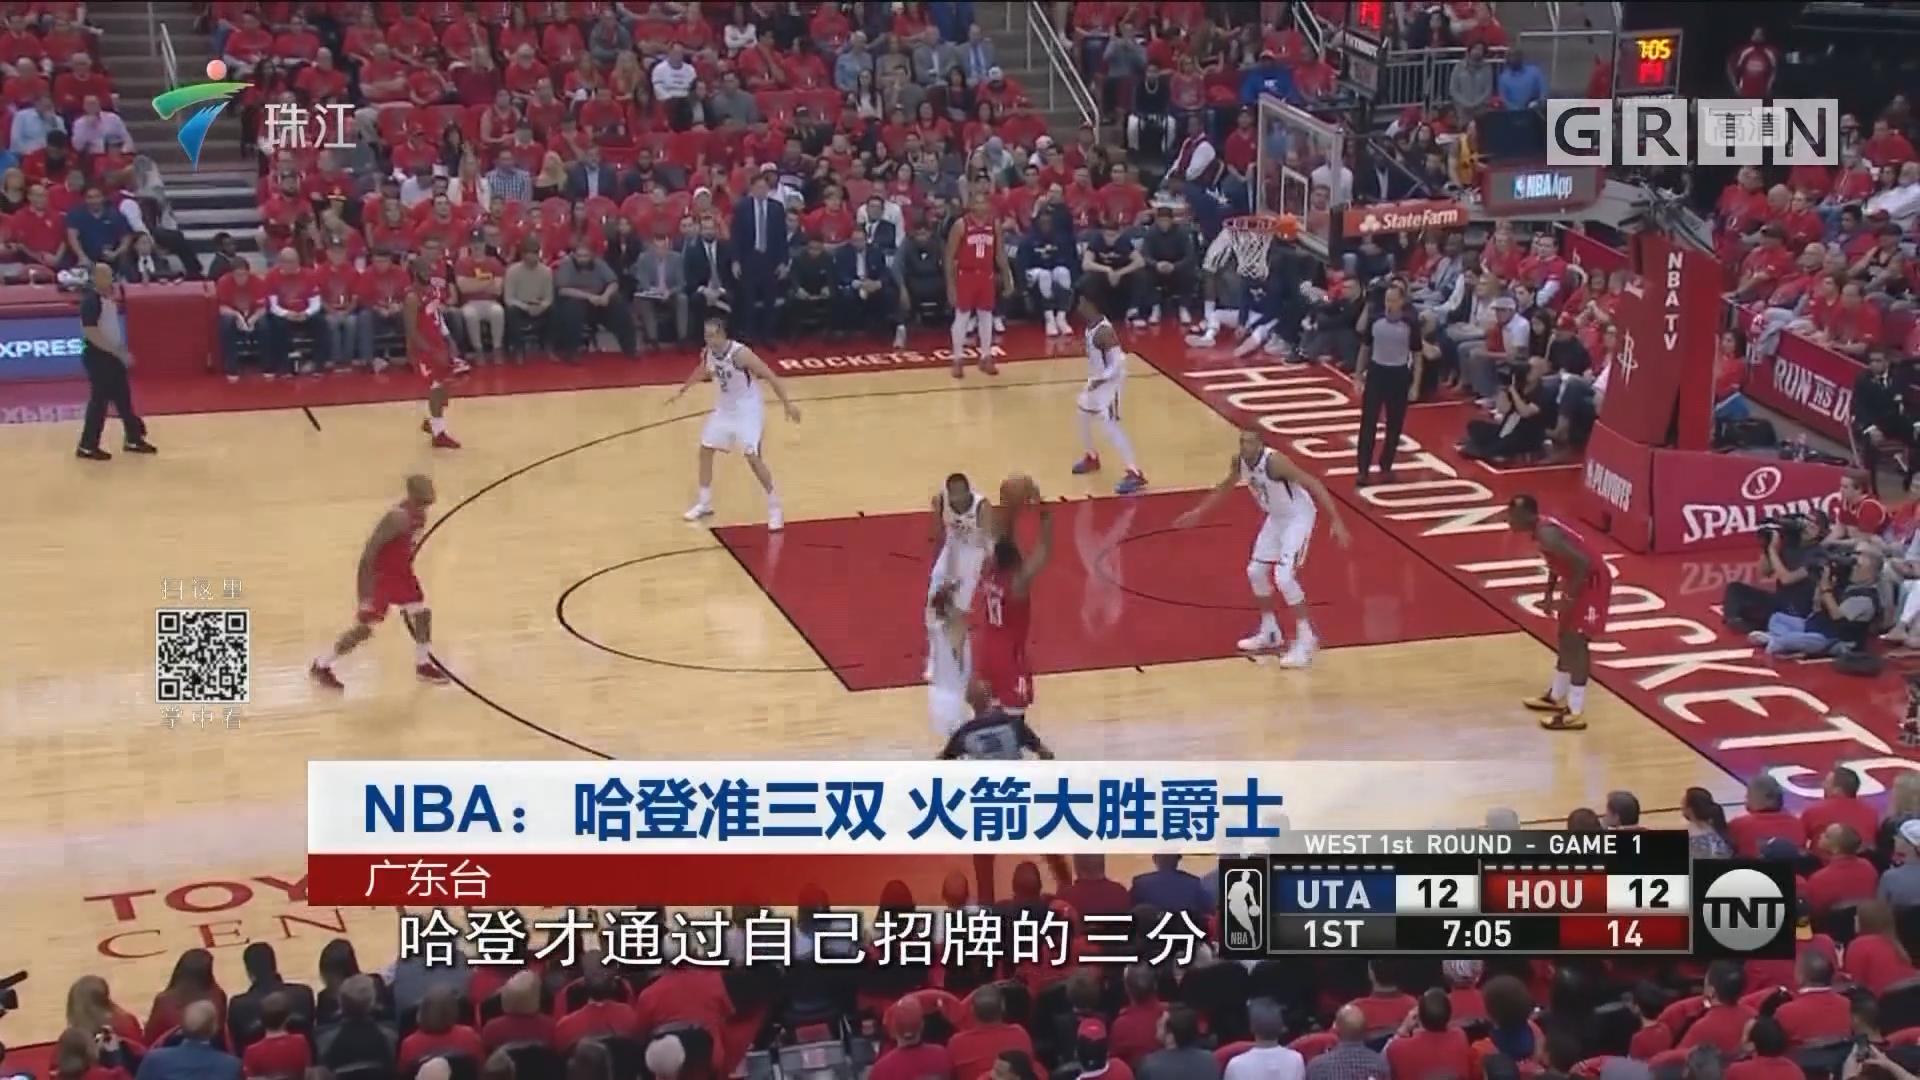 NBA:哈登准三双 火箭大胜爵士